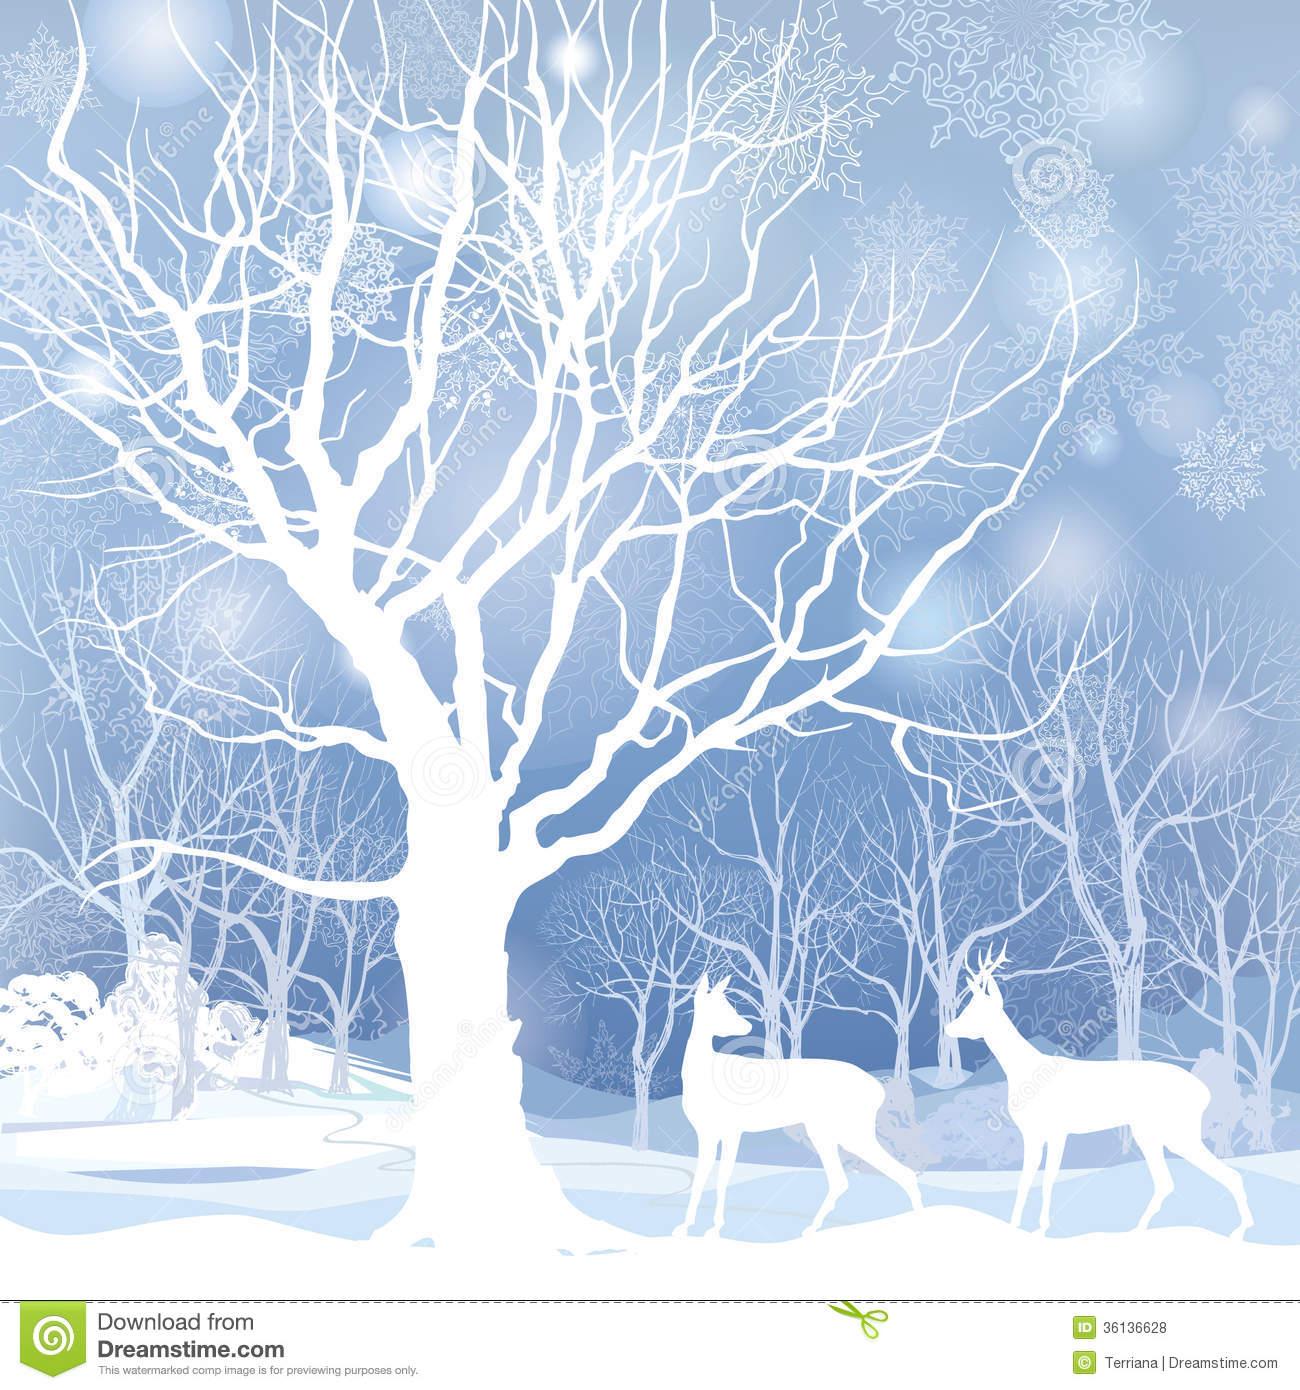 Winter Forest Landscape Illustration Royalty Free Stock Images.